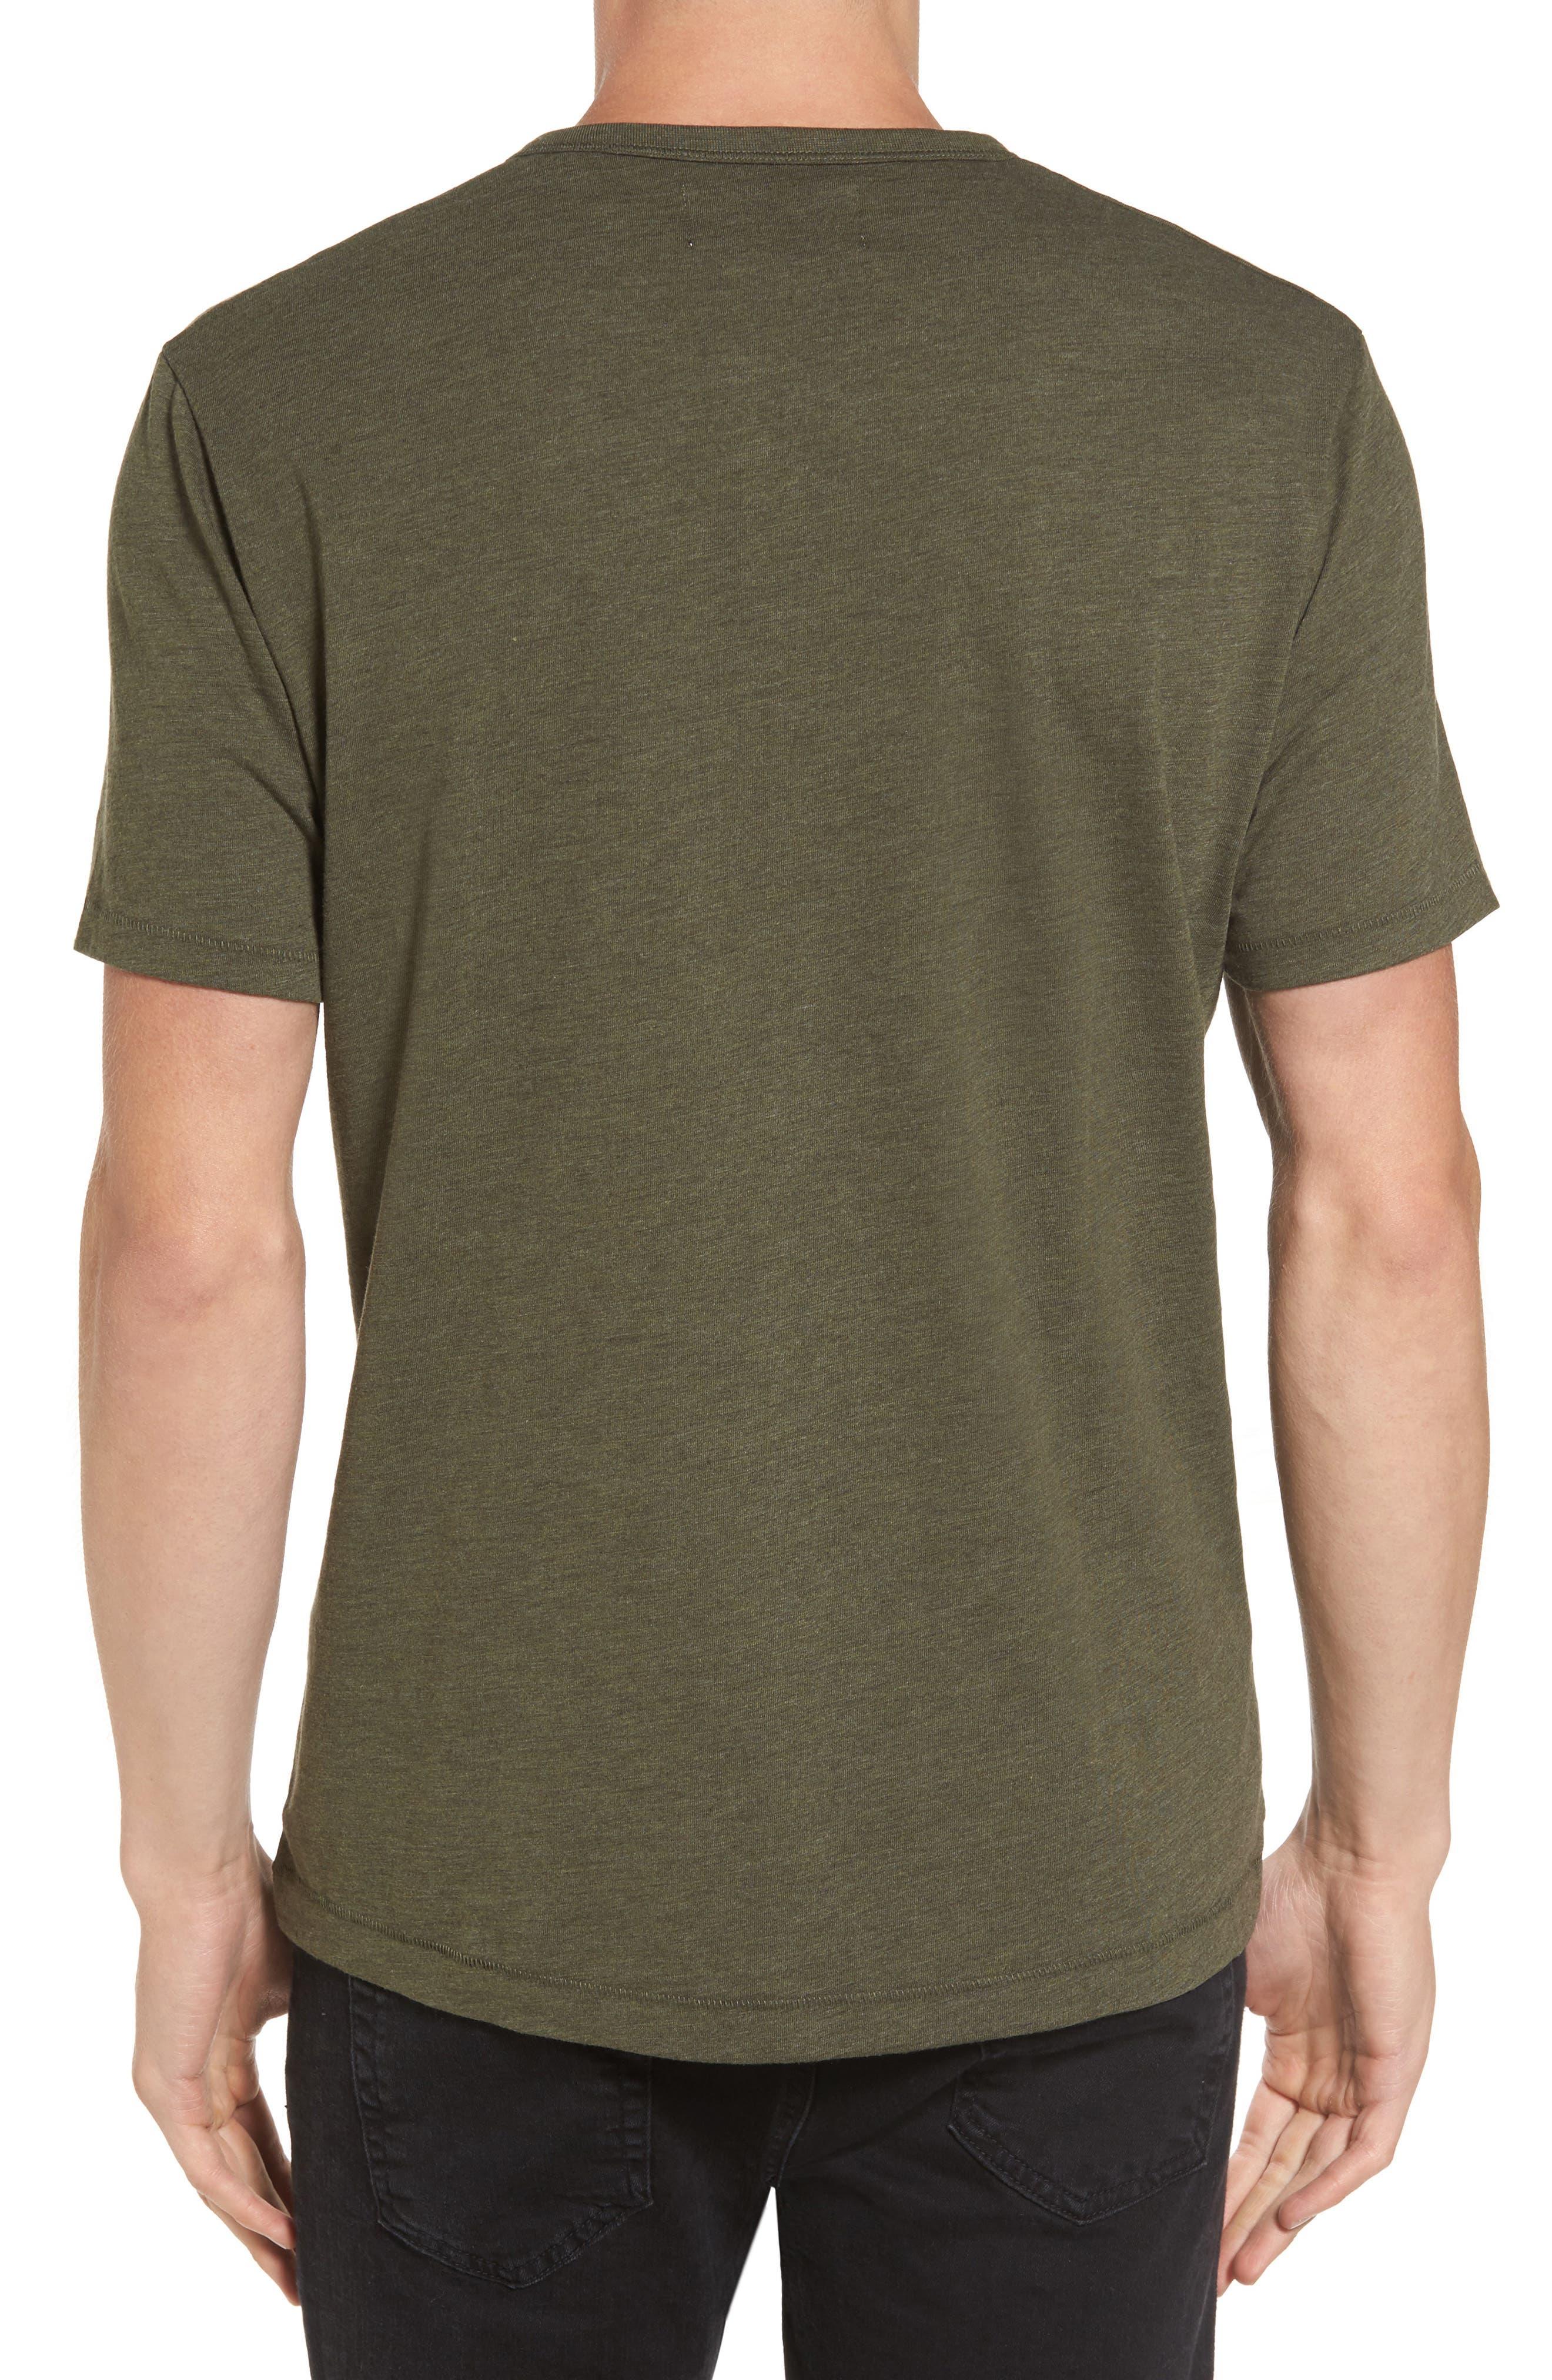 Bing Short Sleeve Henley Shirt,                             Alternate thumbnail 2, color,                             Forest Night